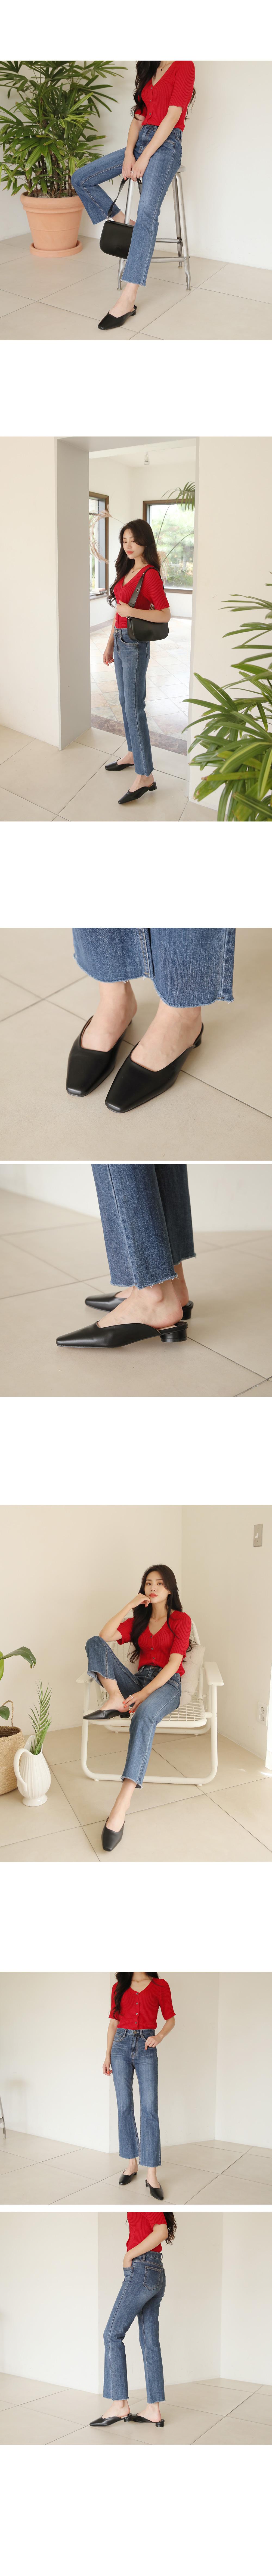 Penin-shoes